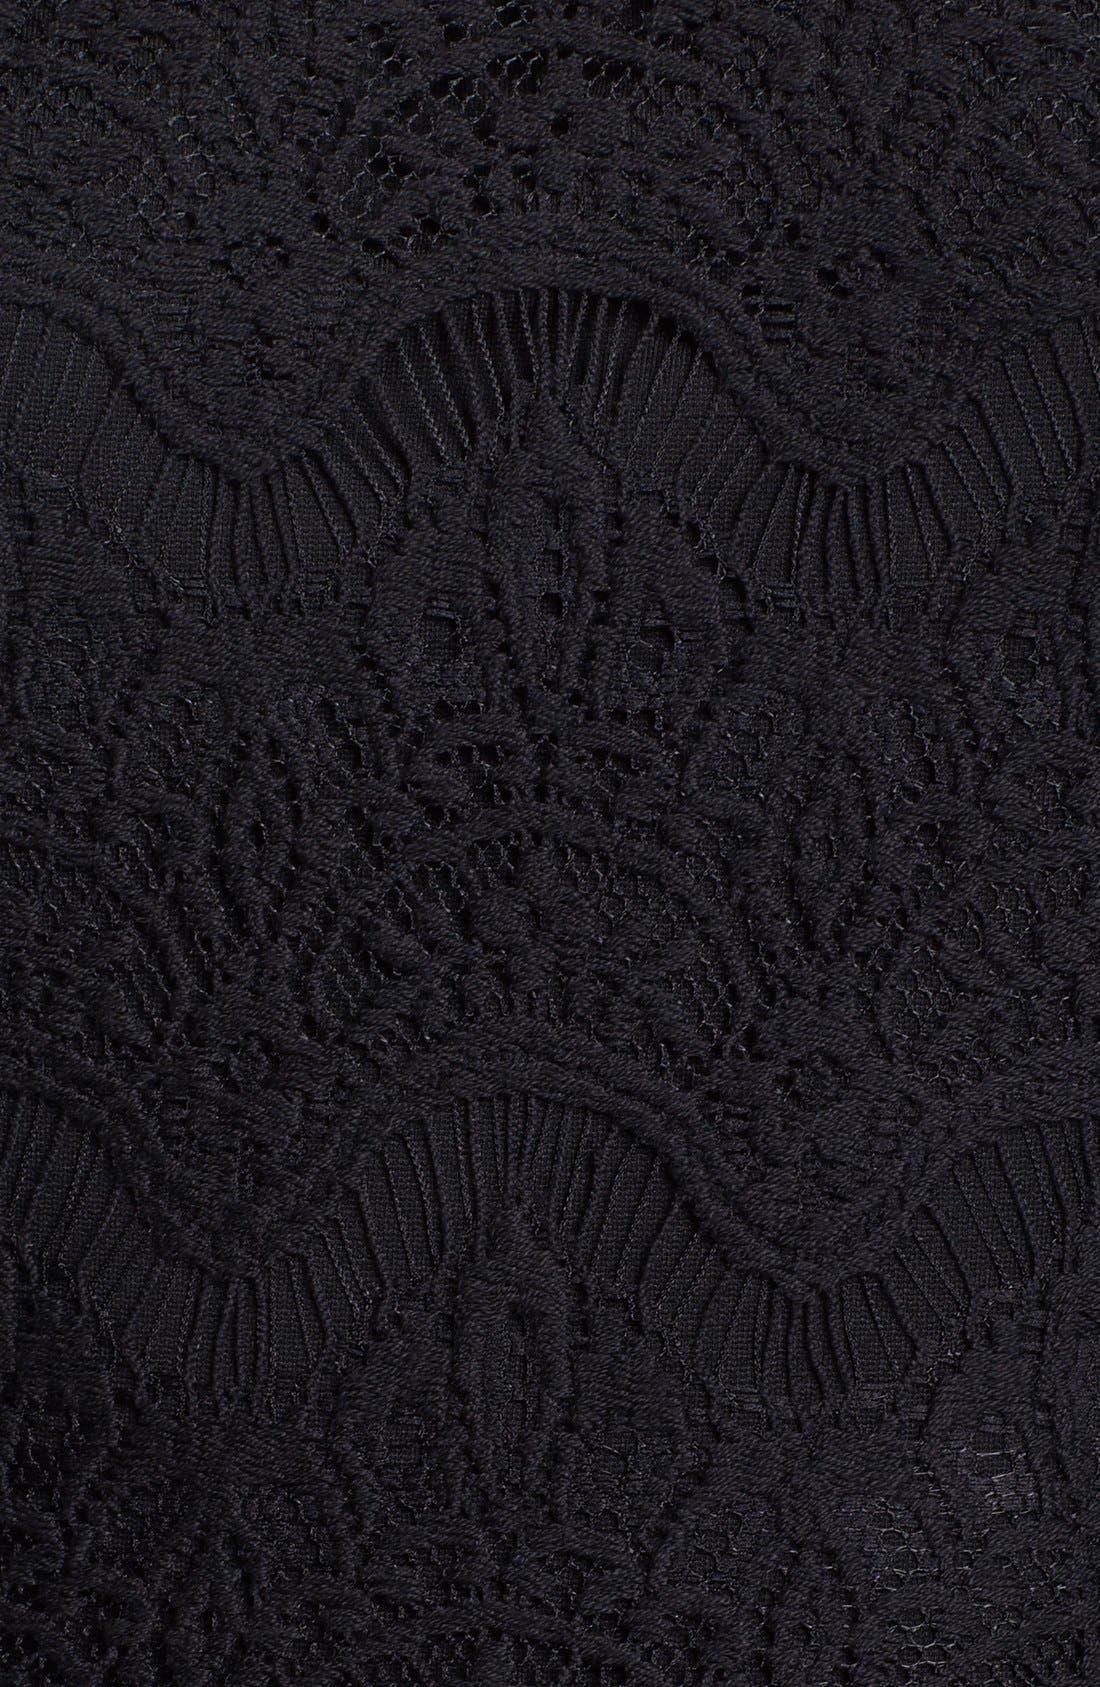 Alternate Image 3  - Lilly Pulitzer® 'Remmy' Lace Bodice Ponte Knit Fit & Flare Dress